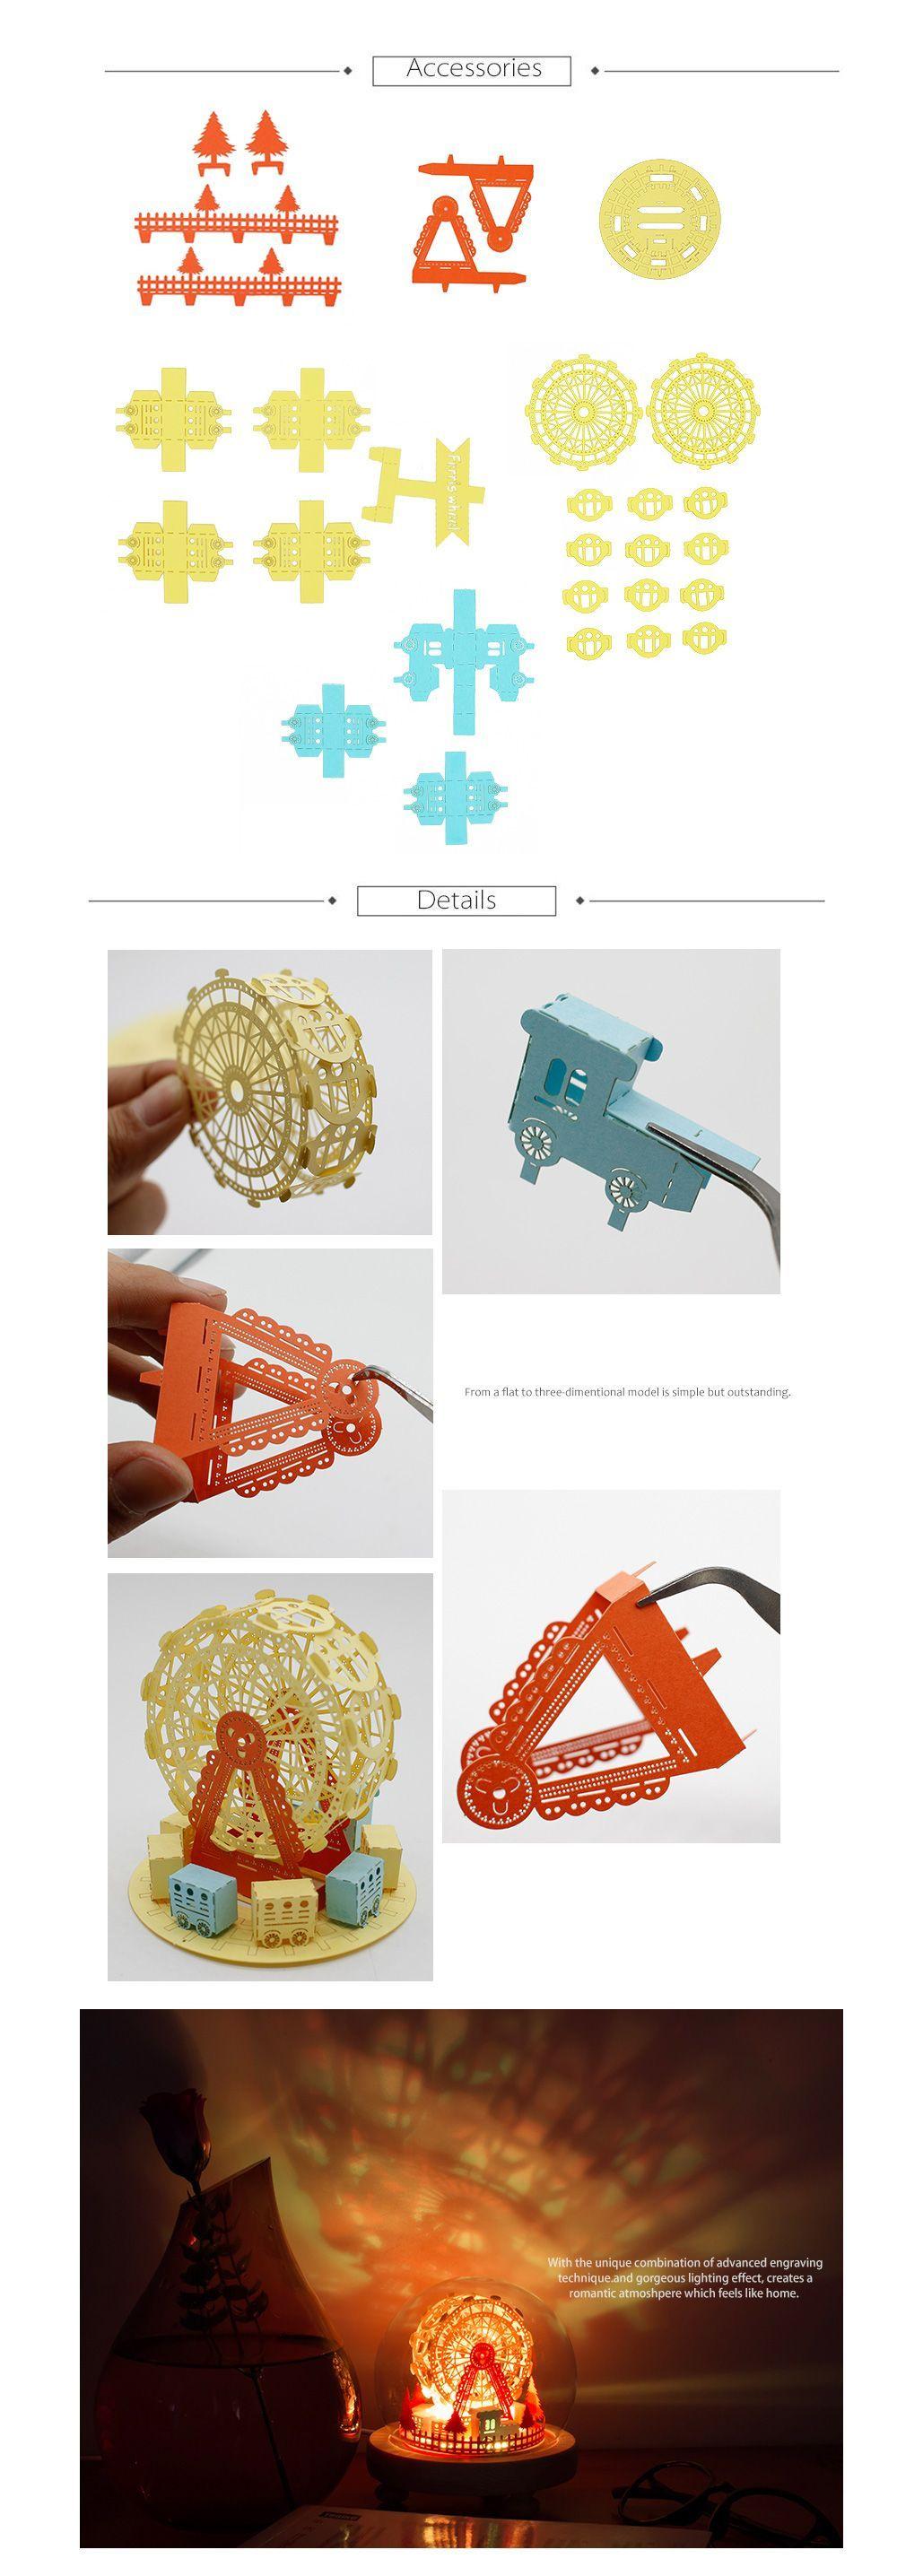 DIY Ferris Wheel Night Light Kit Exquisite 3D Paper Art